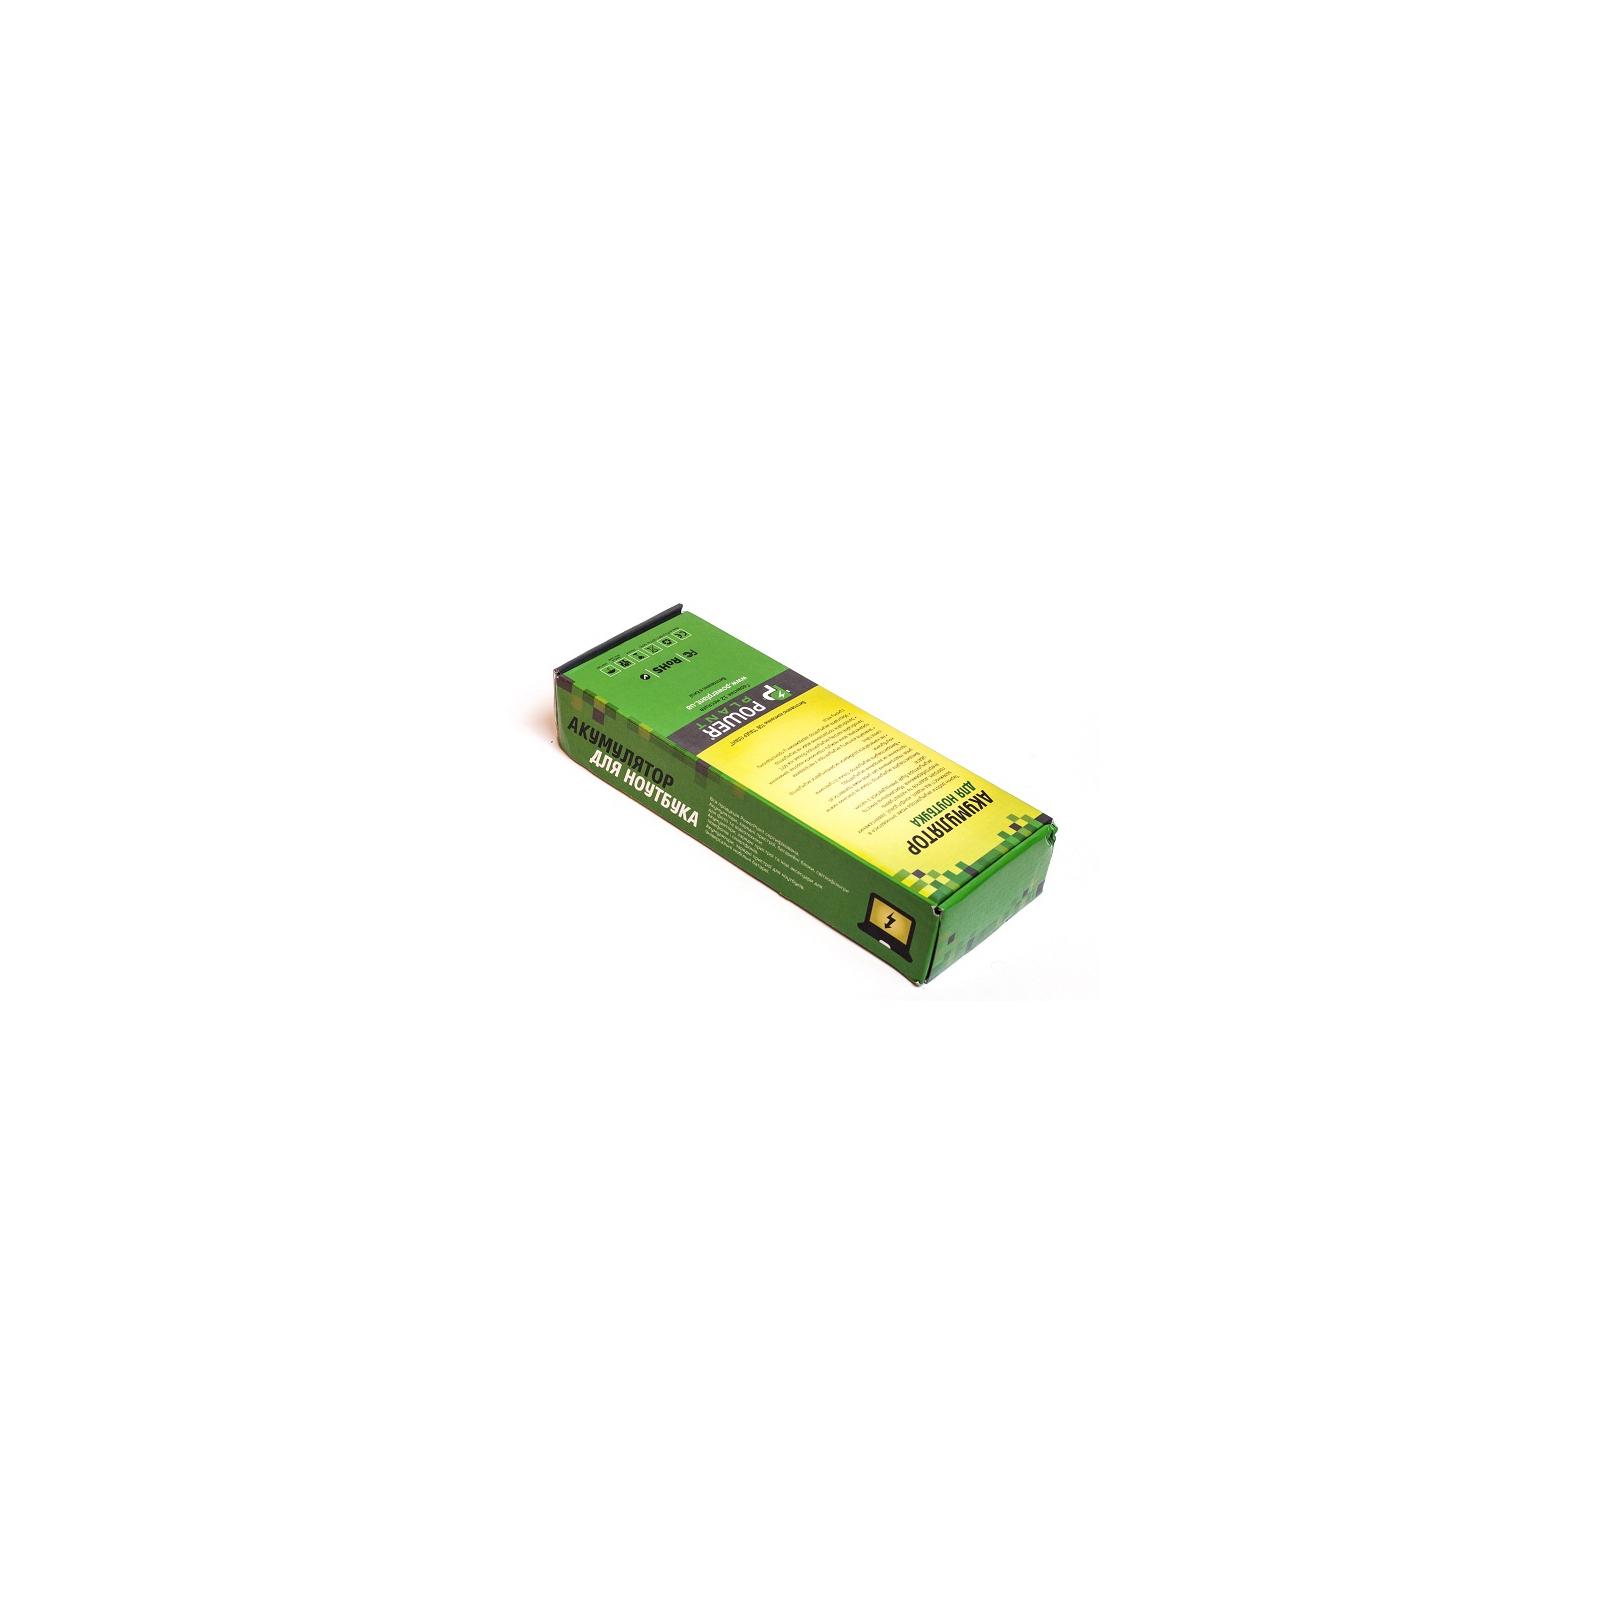 Аккумулятор для ноутбука DELL Inspiron Mini 10 (H766N, DL1011LH) 11.1V 5200mAh PowerPlant (NB00000113) изображение 2